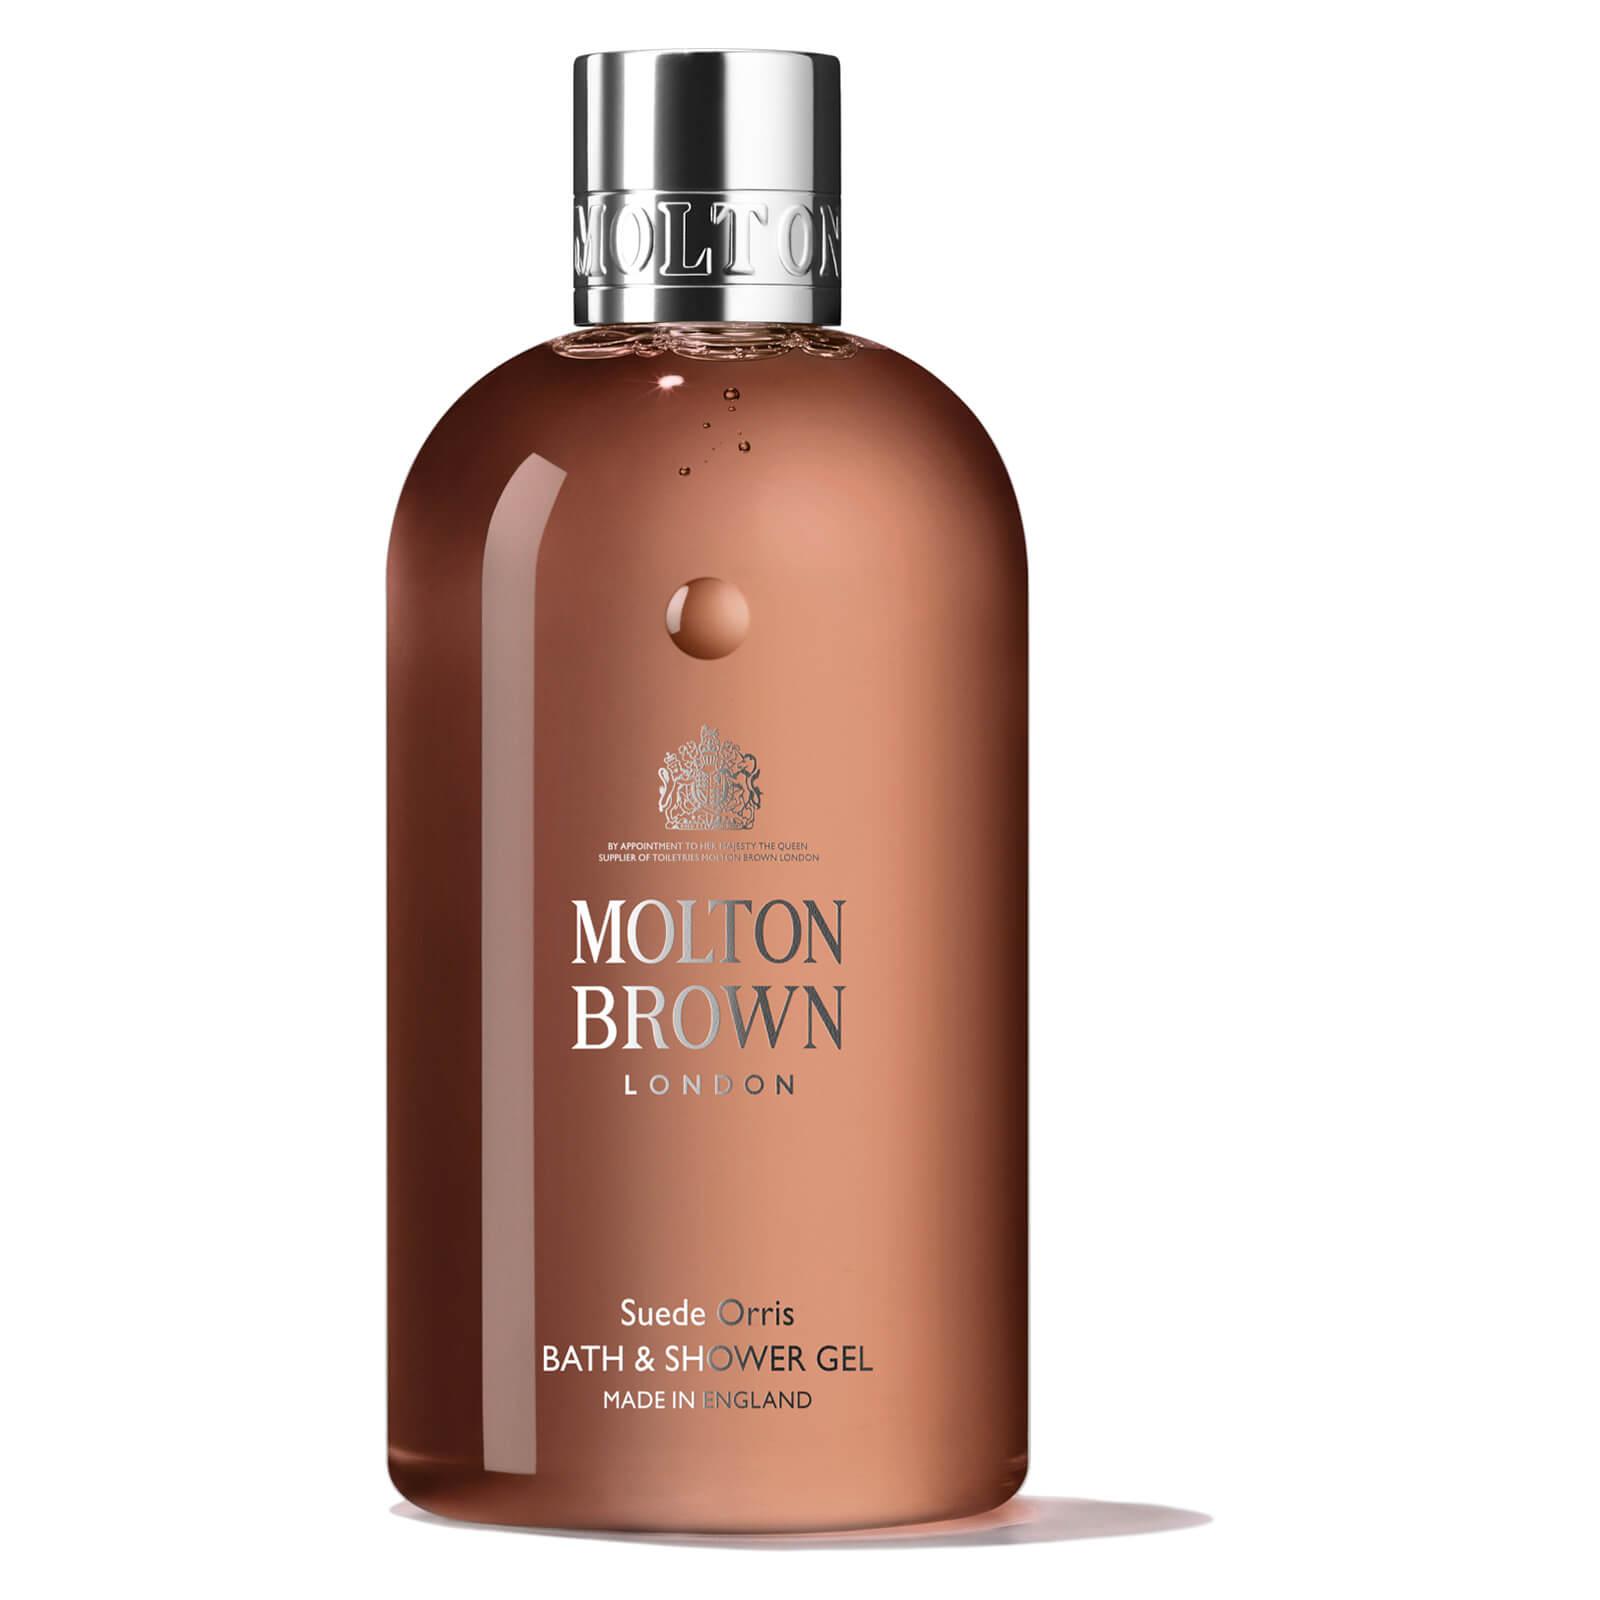 Molton Brown 摩顿布朗 Suede Orris 麂绒鸢尾草沐浴露 300ml